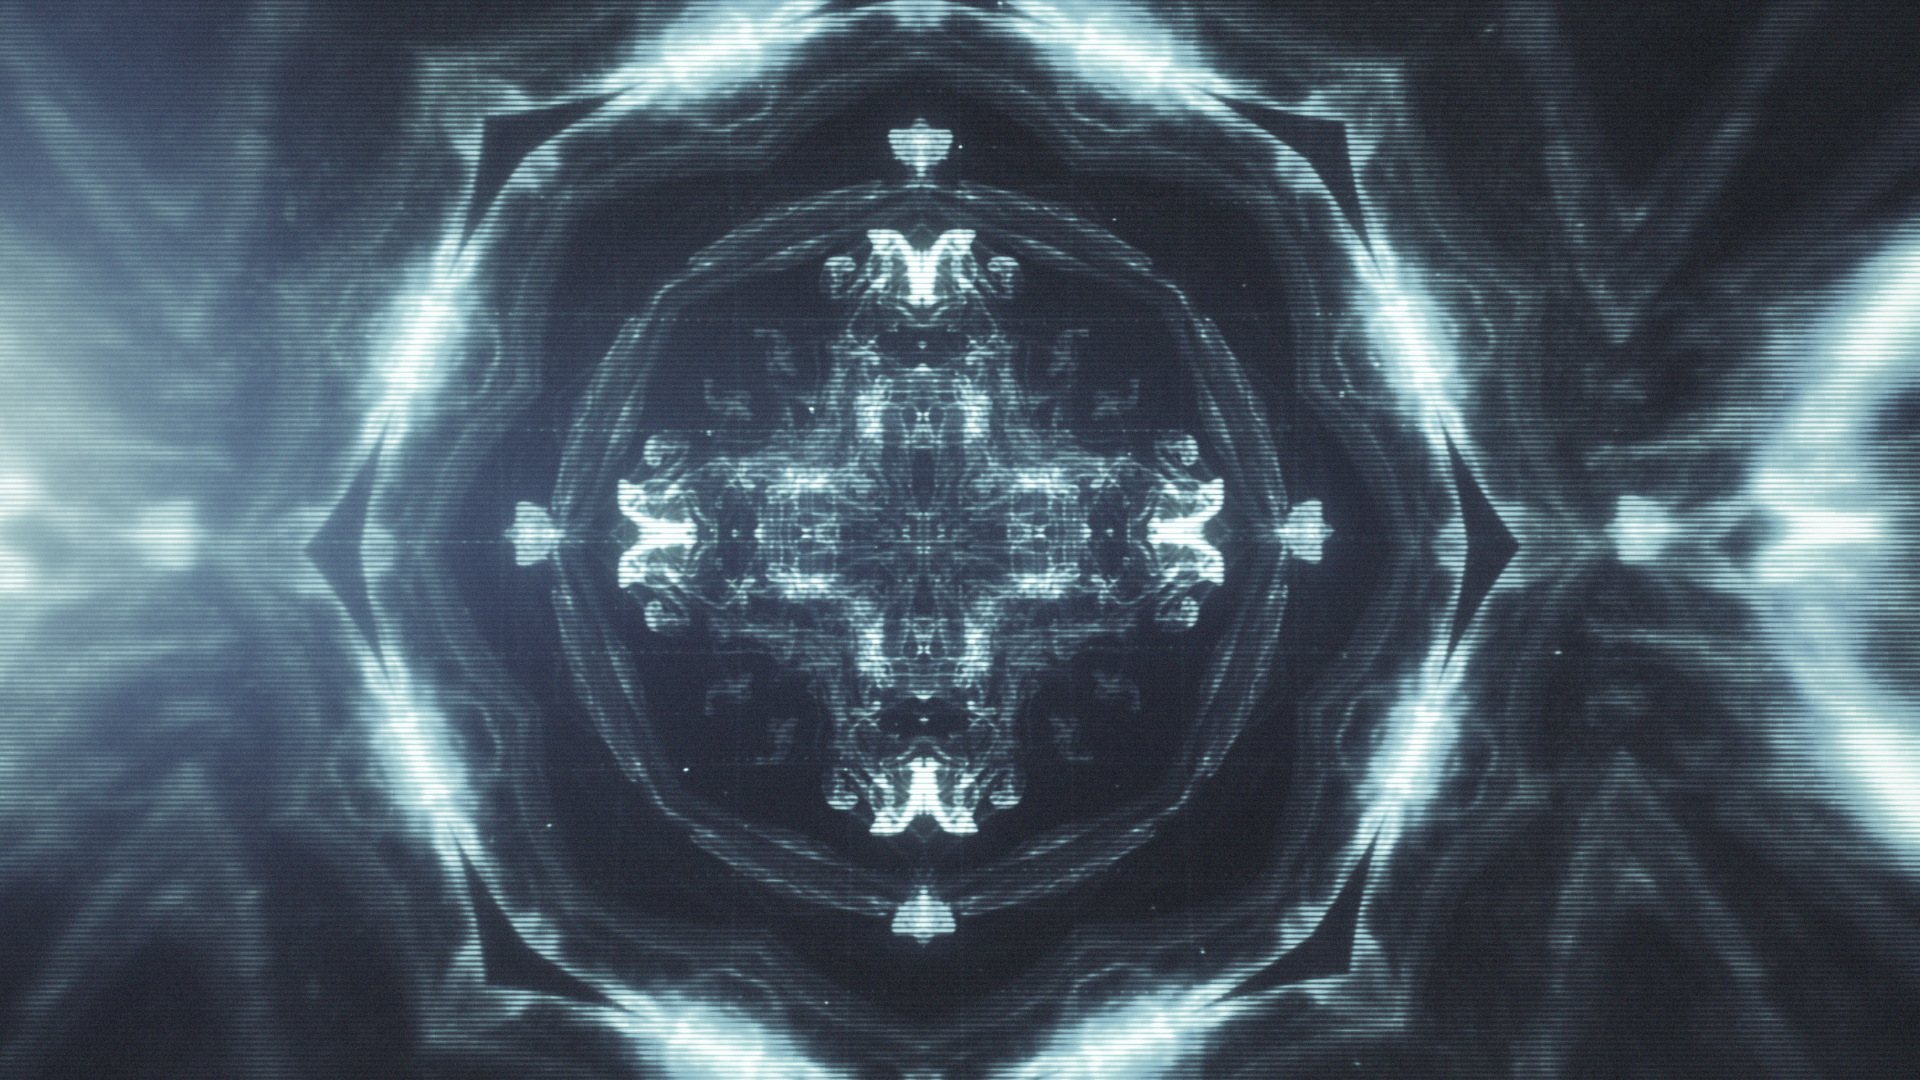 Symmetrical-Ink-Flow-Designs-Full-Res